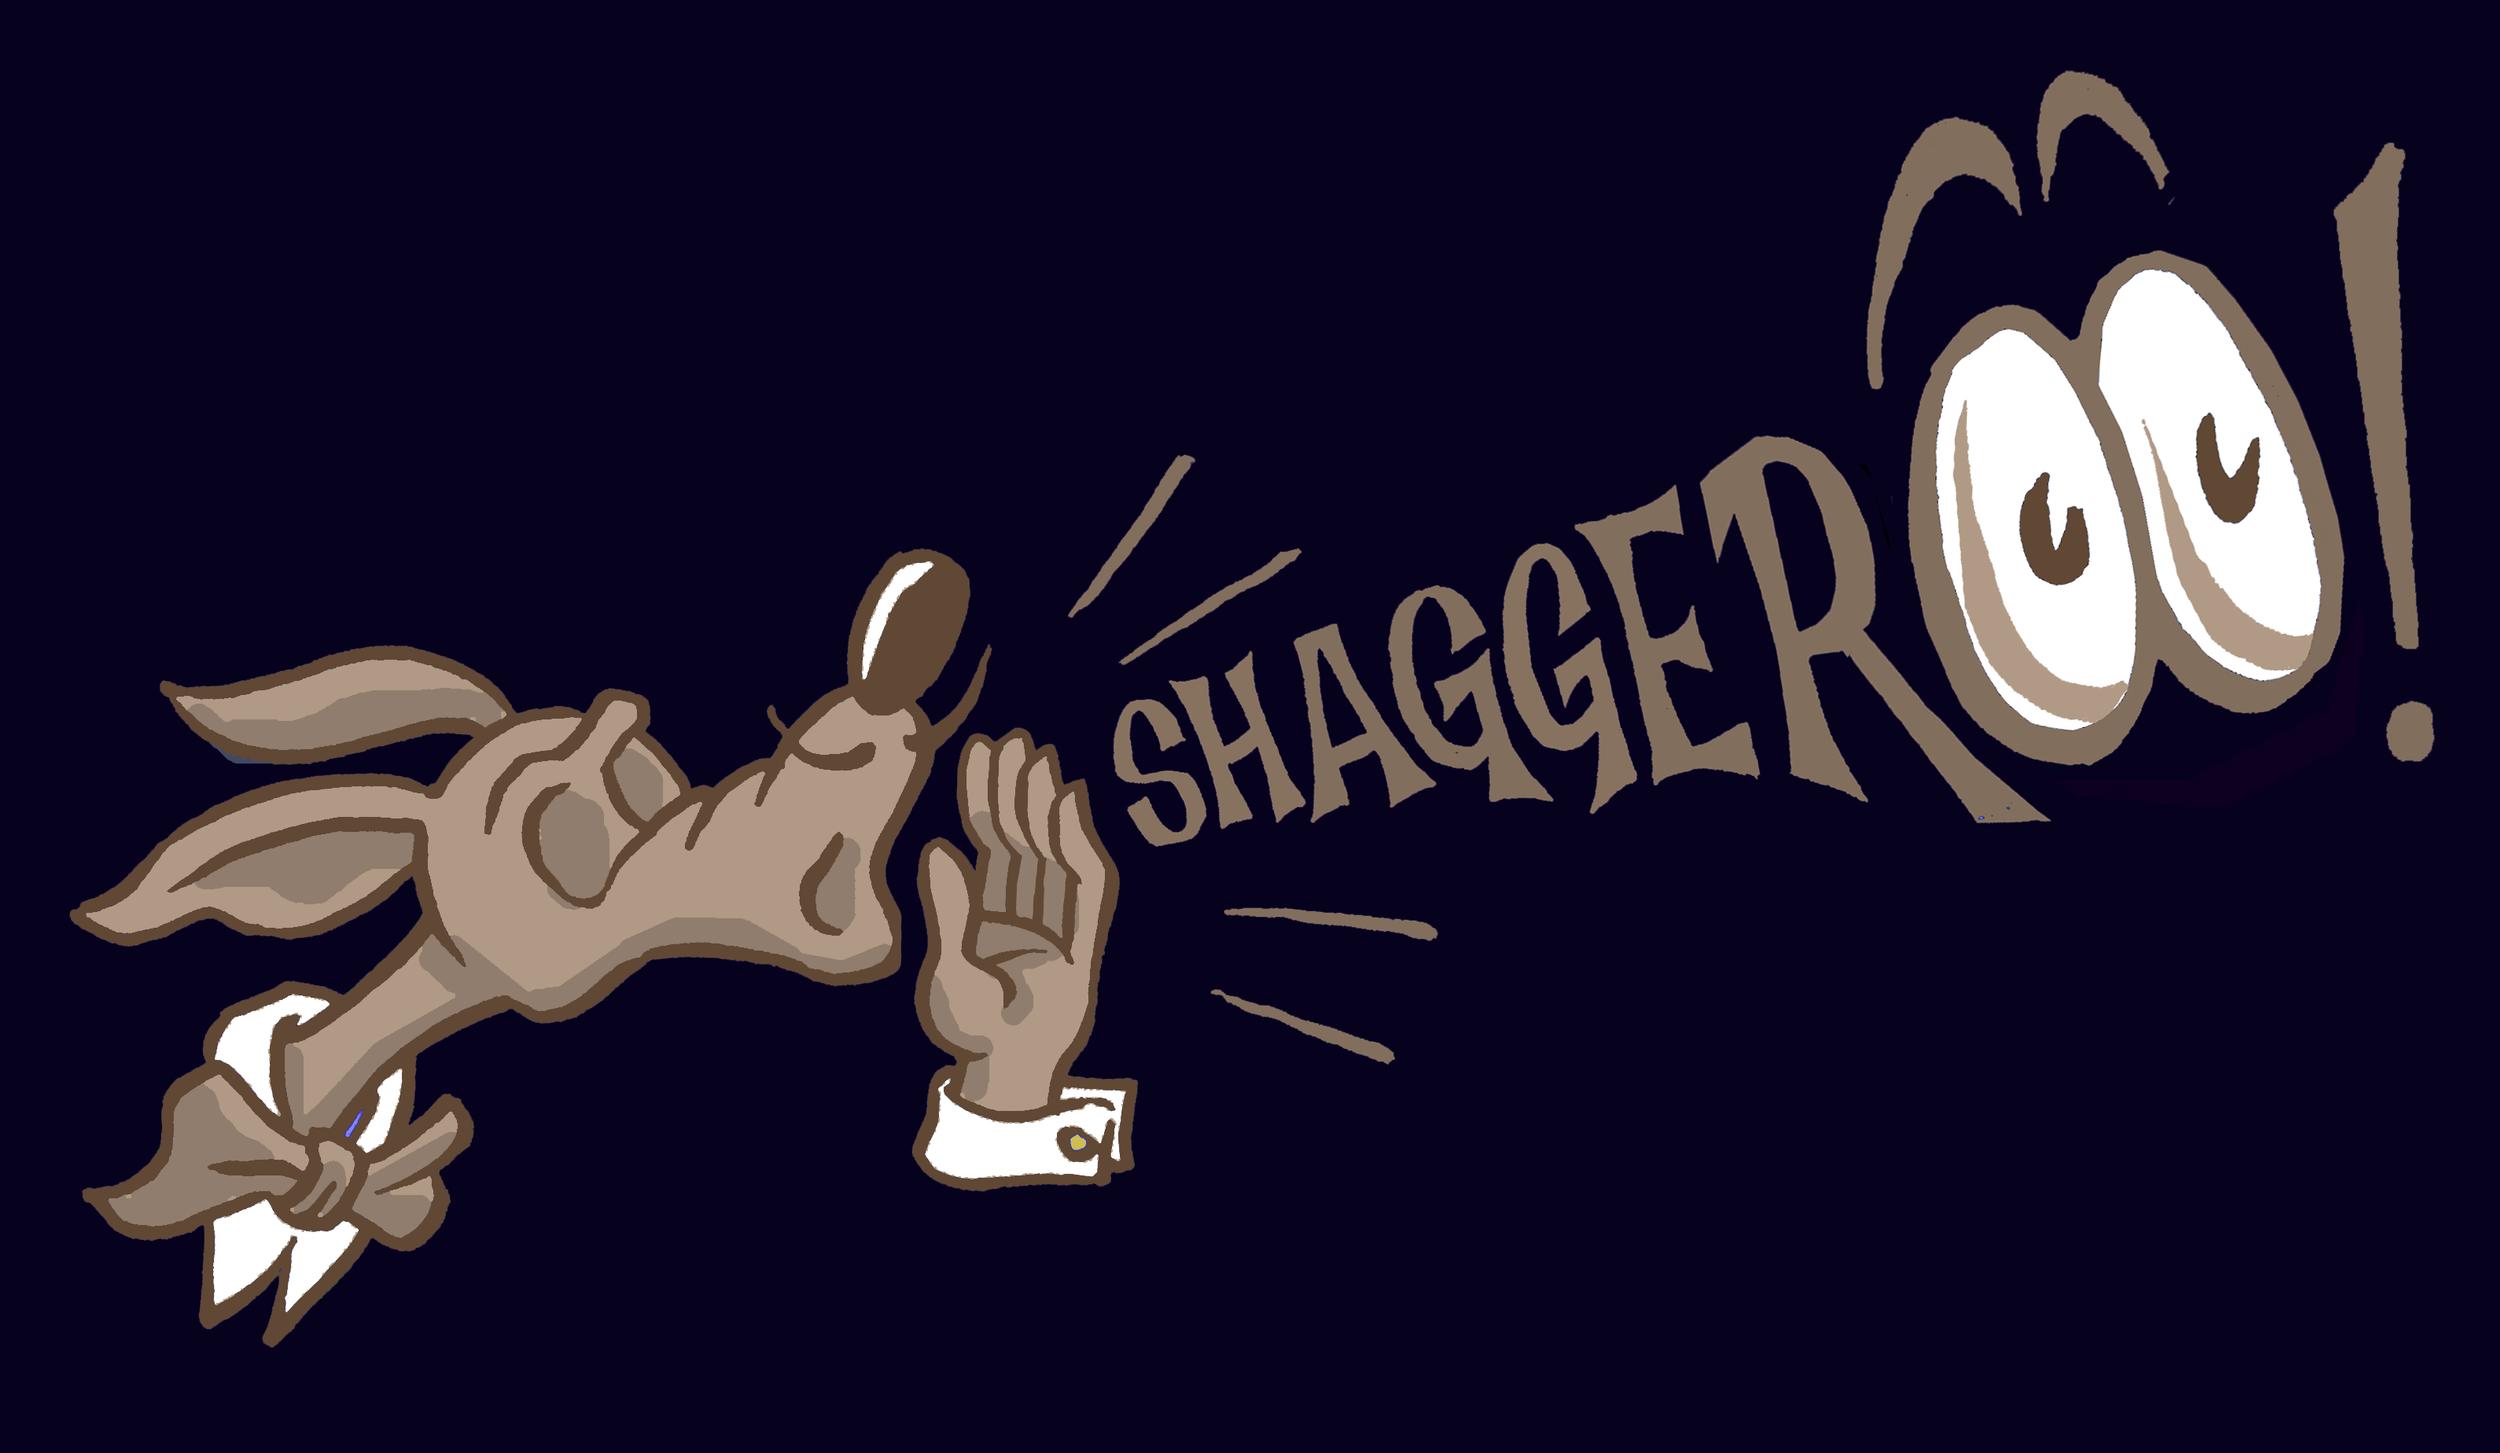 shaggeroo_col2.png